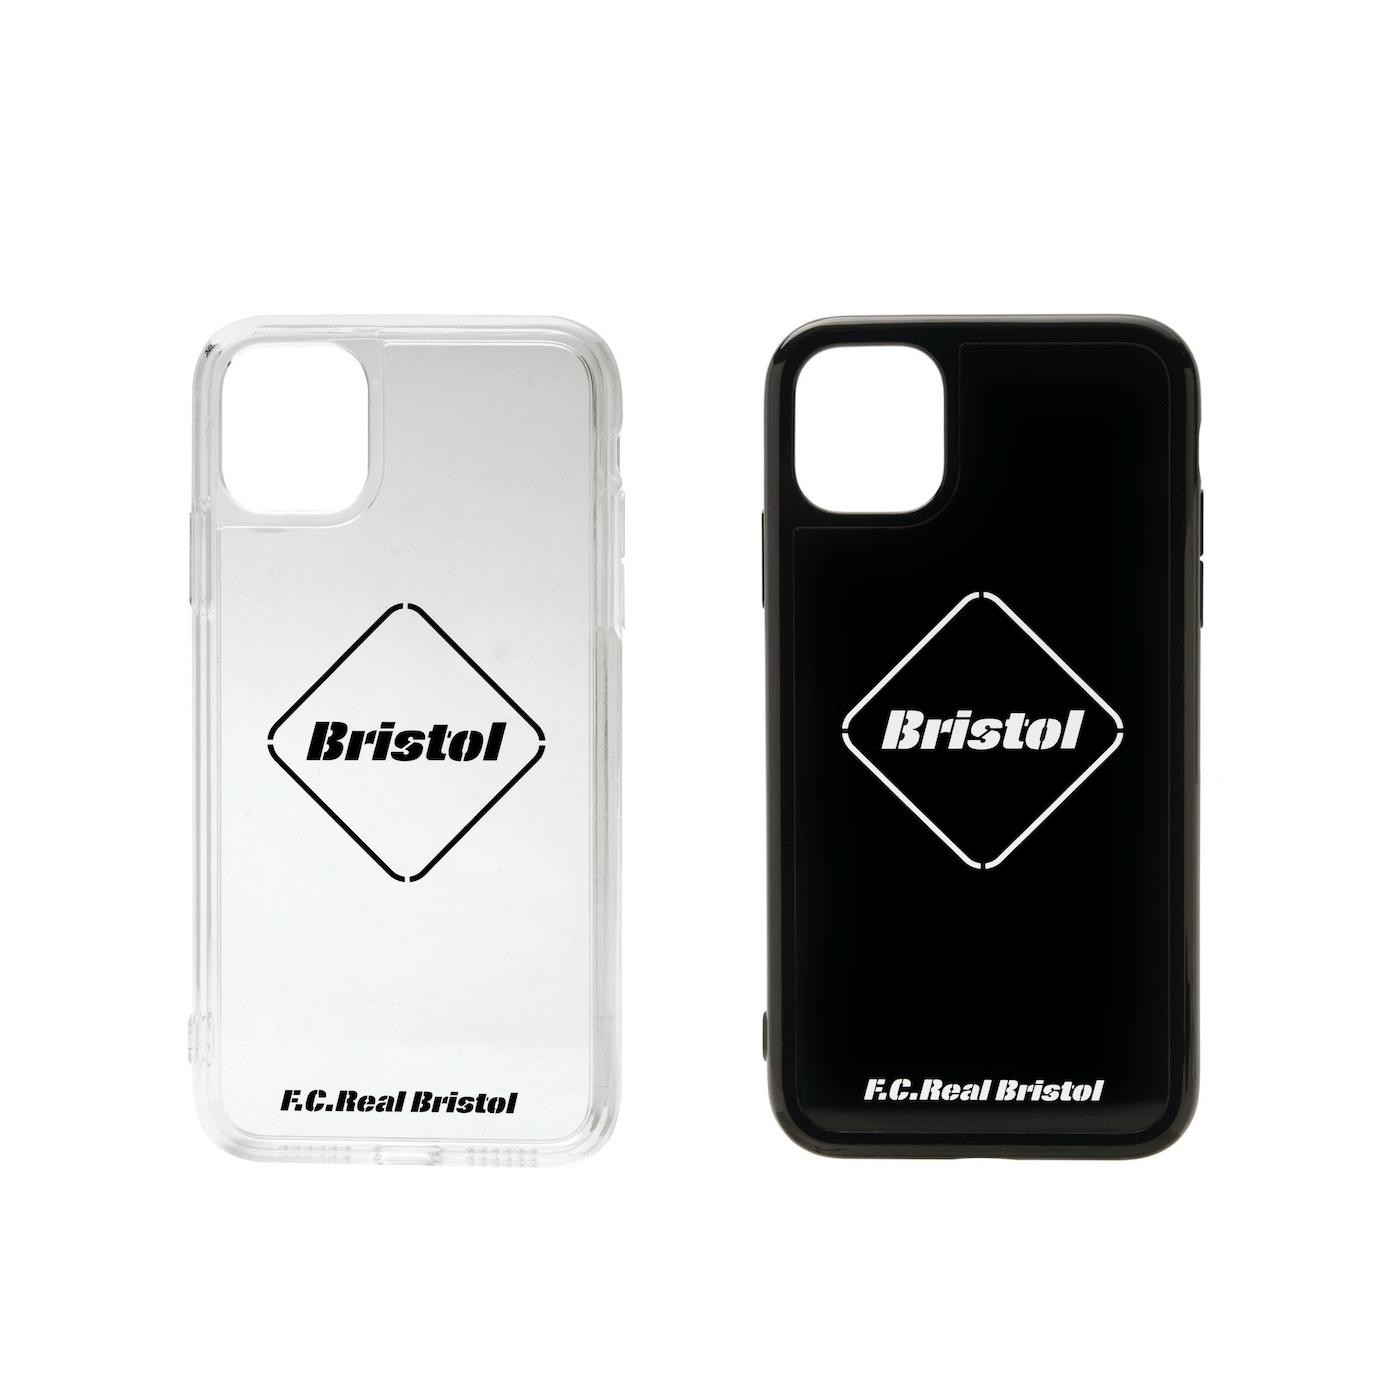 F.C.Real Bristol / EMBLEM PHONE CASE for iPhone 11